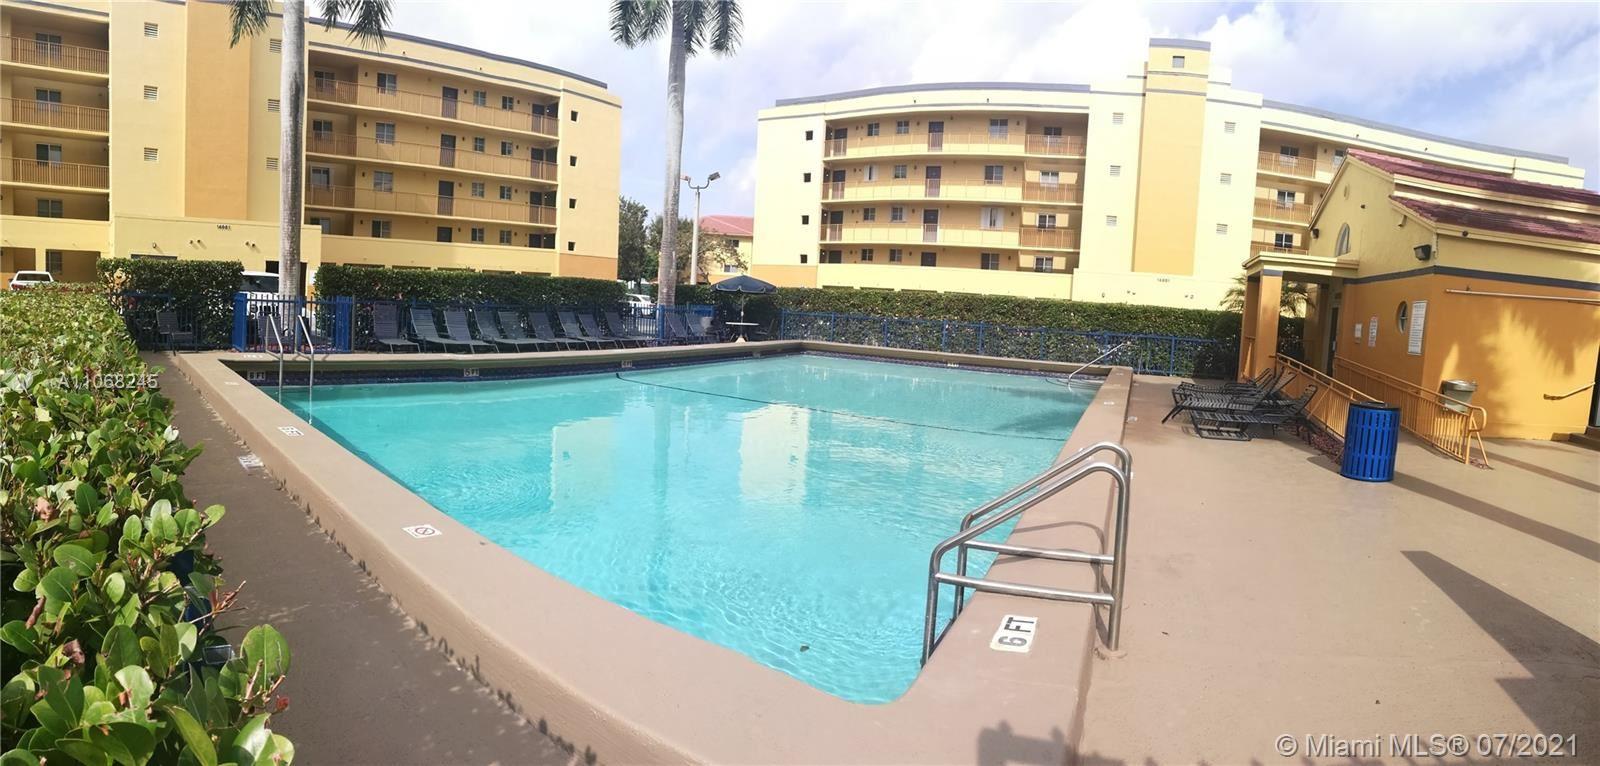 14931 SW 82nd Ln #18-102, Miami, FL 33193 - #: A11068245